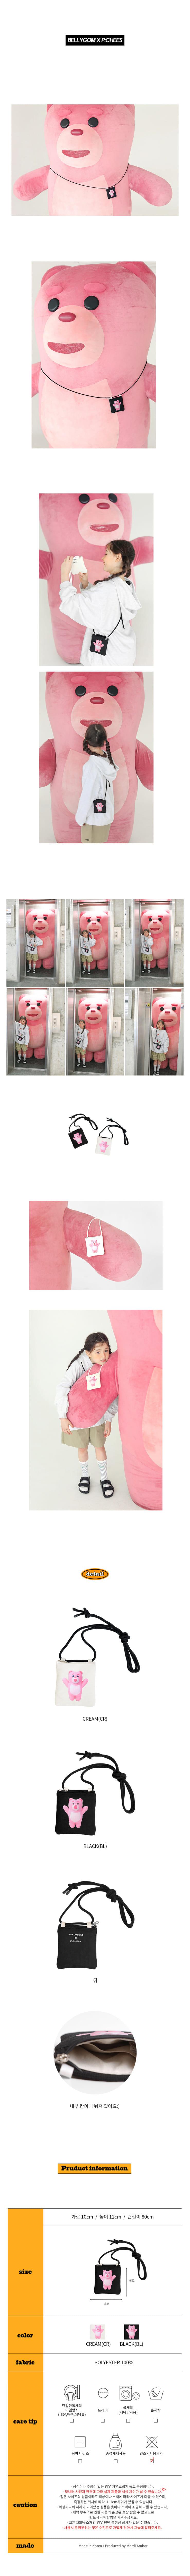 PEACH-CREAM - Korean Children Fashion - #Kfashion4kids - Bellygom Pchees Card Wallrt - 2